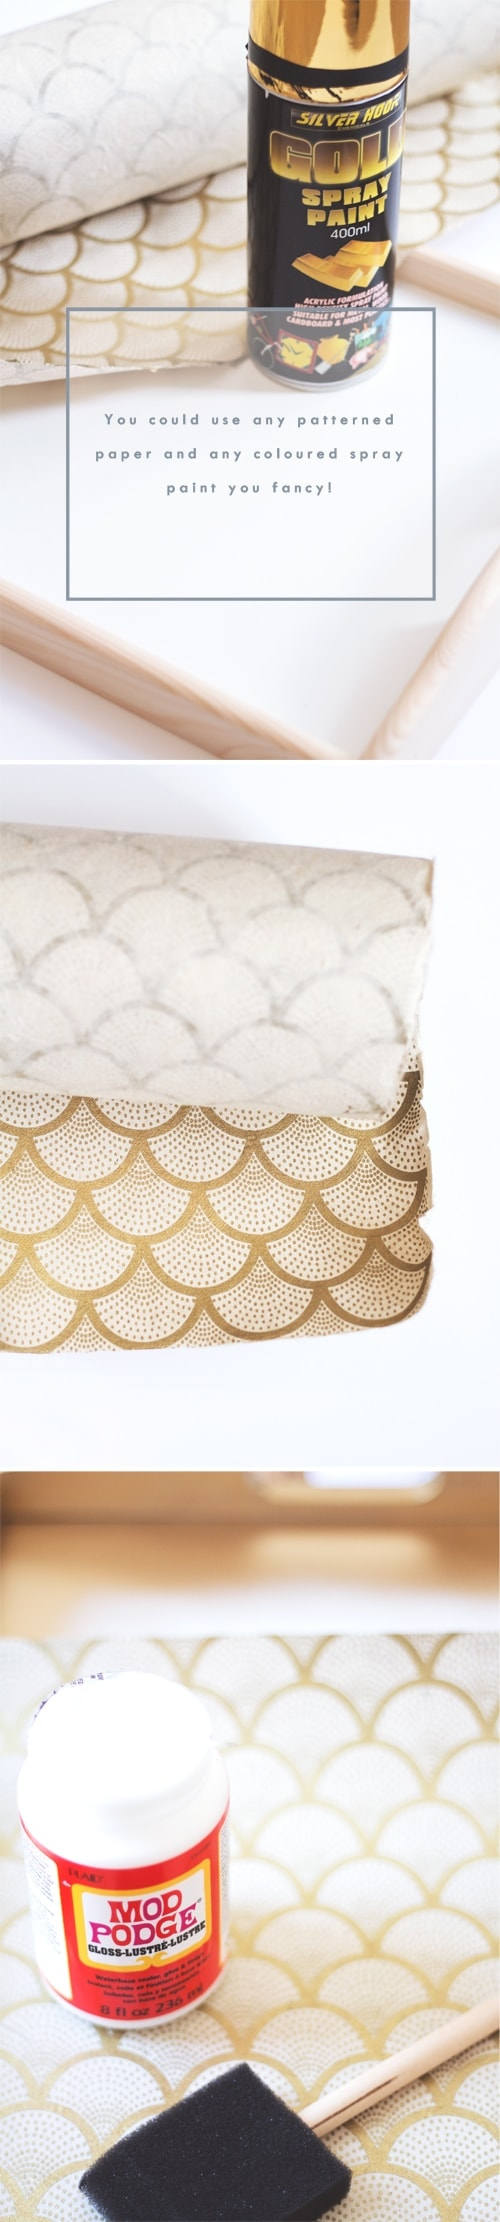 diy patterned tray 2